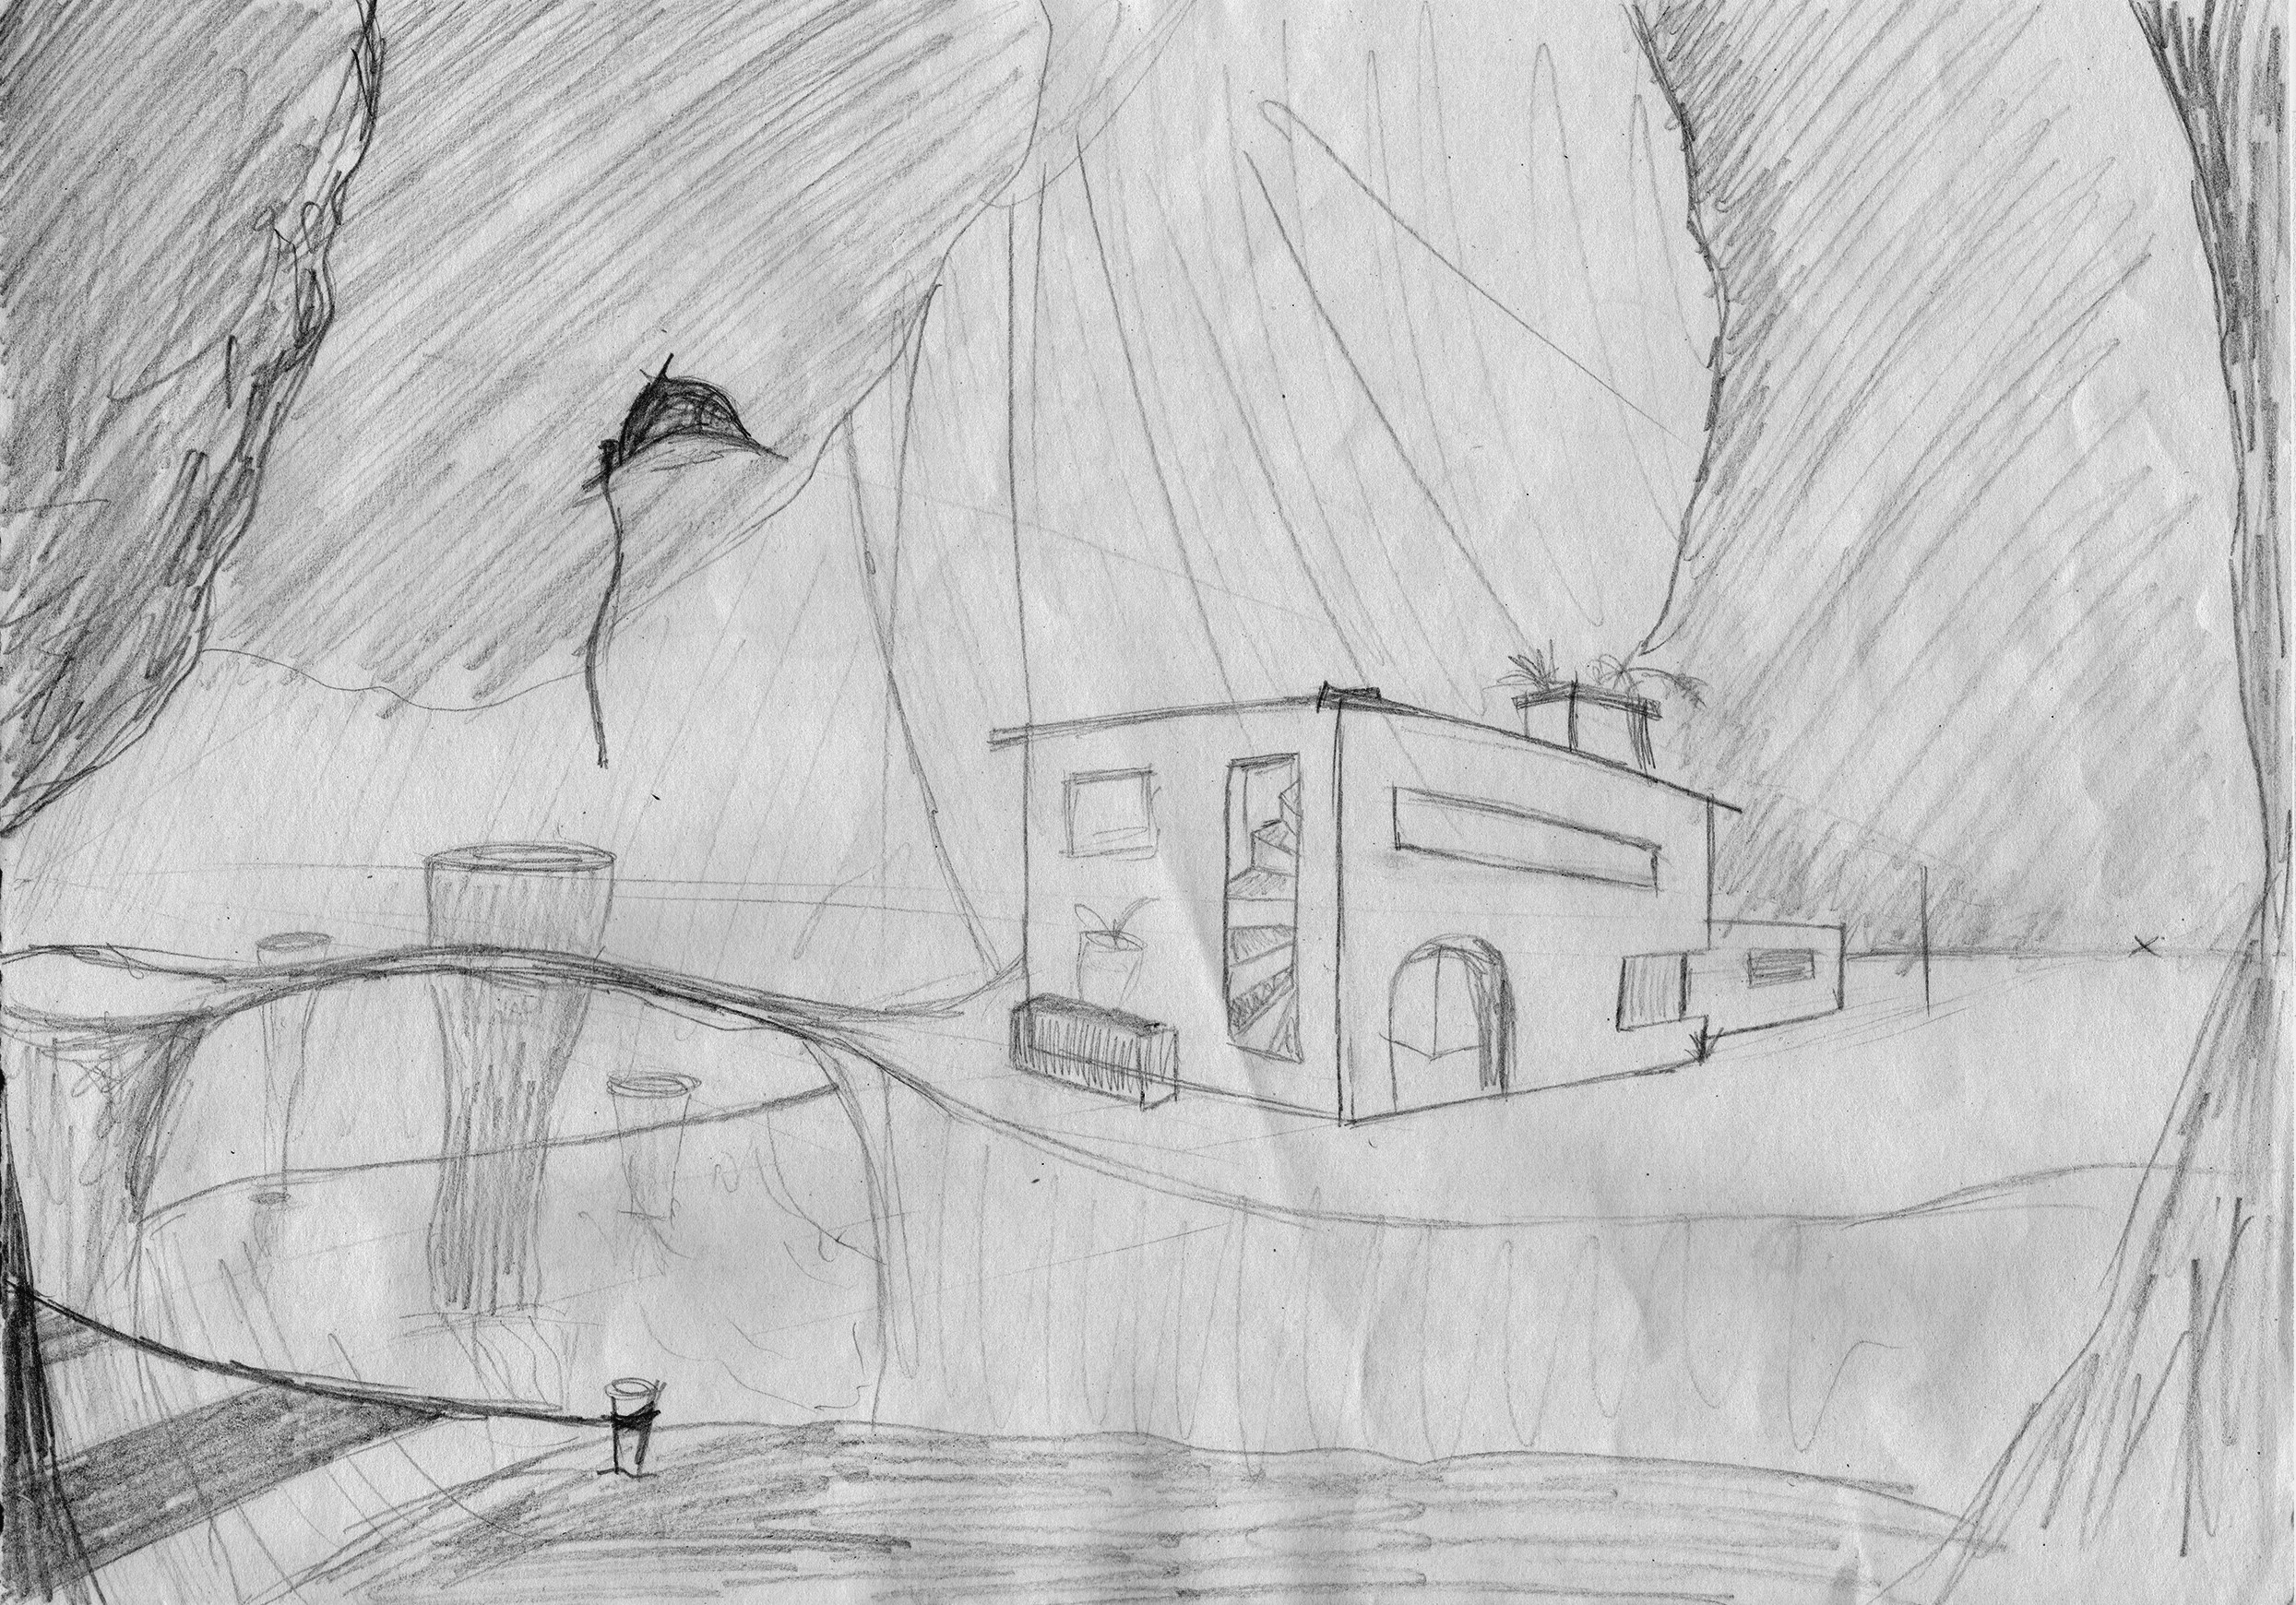 Final concept sketch.